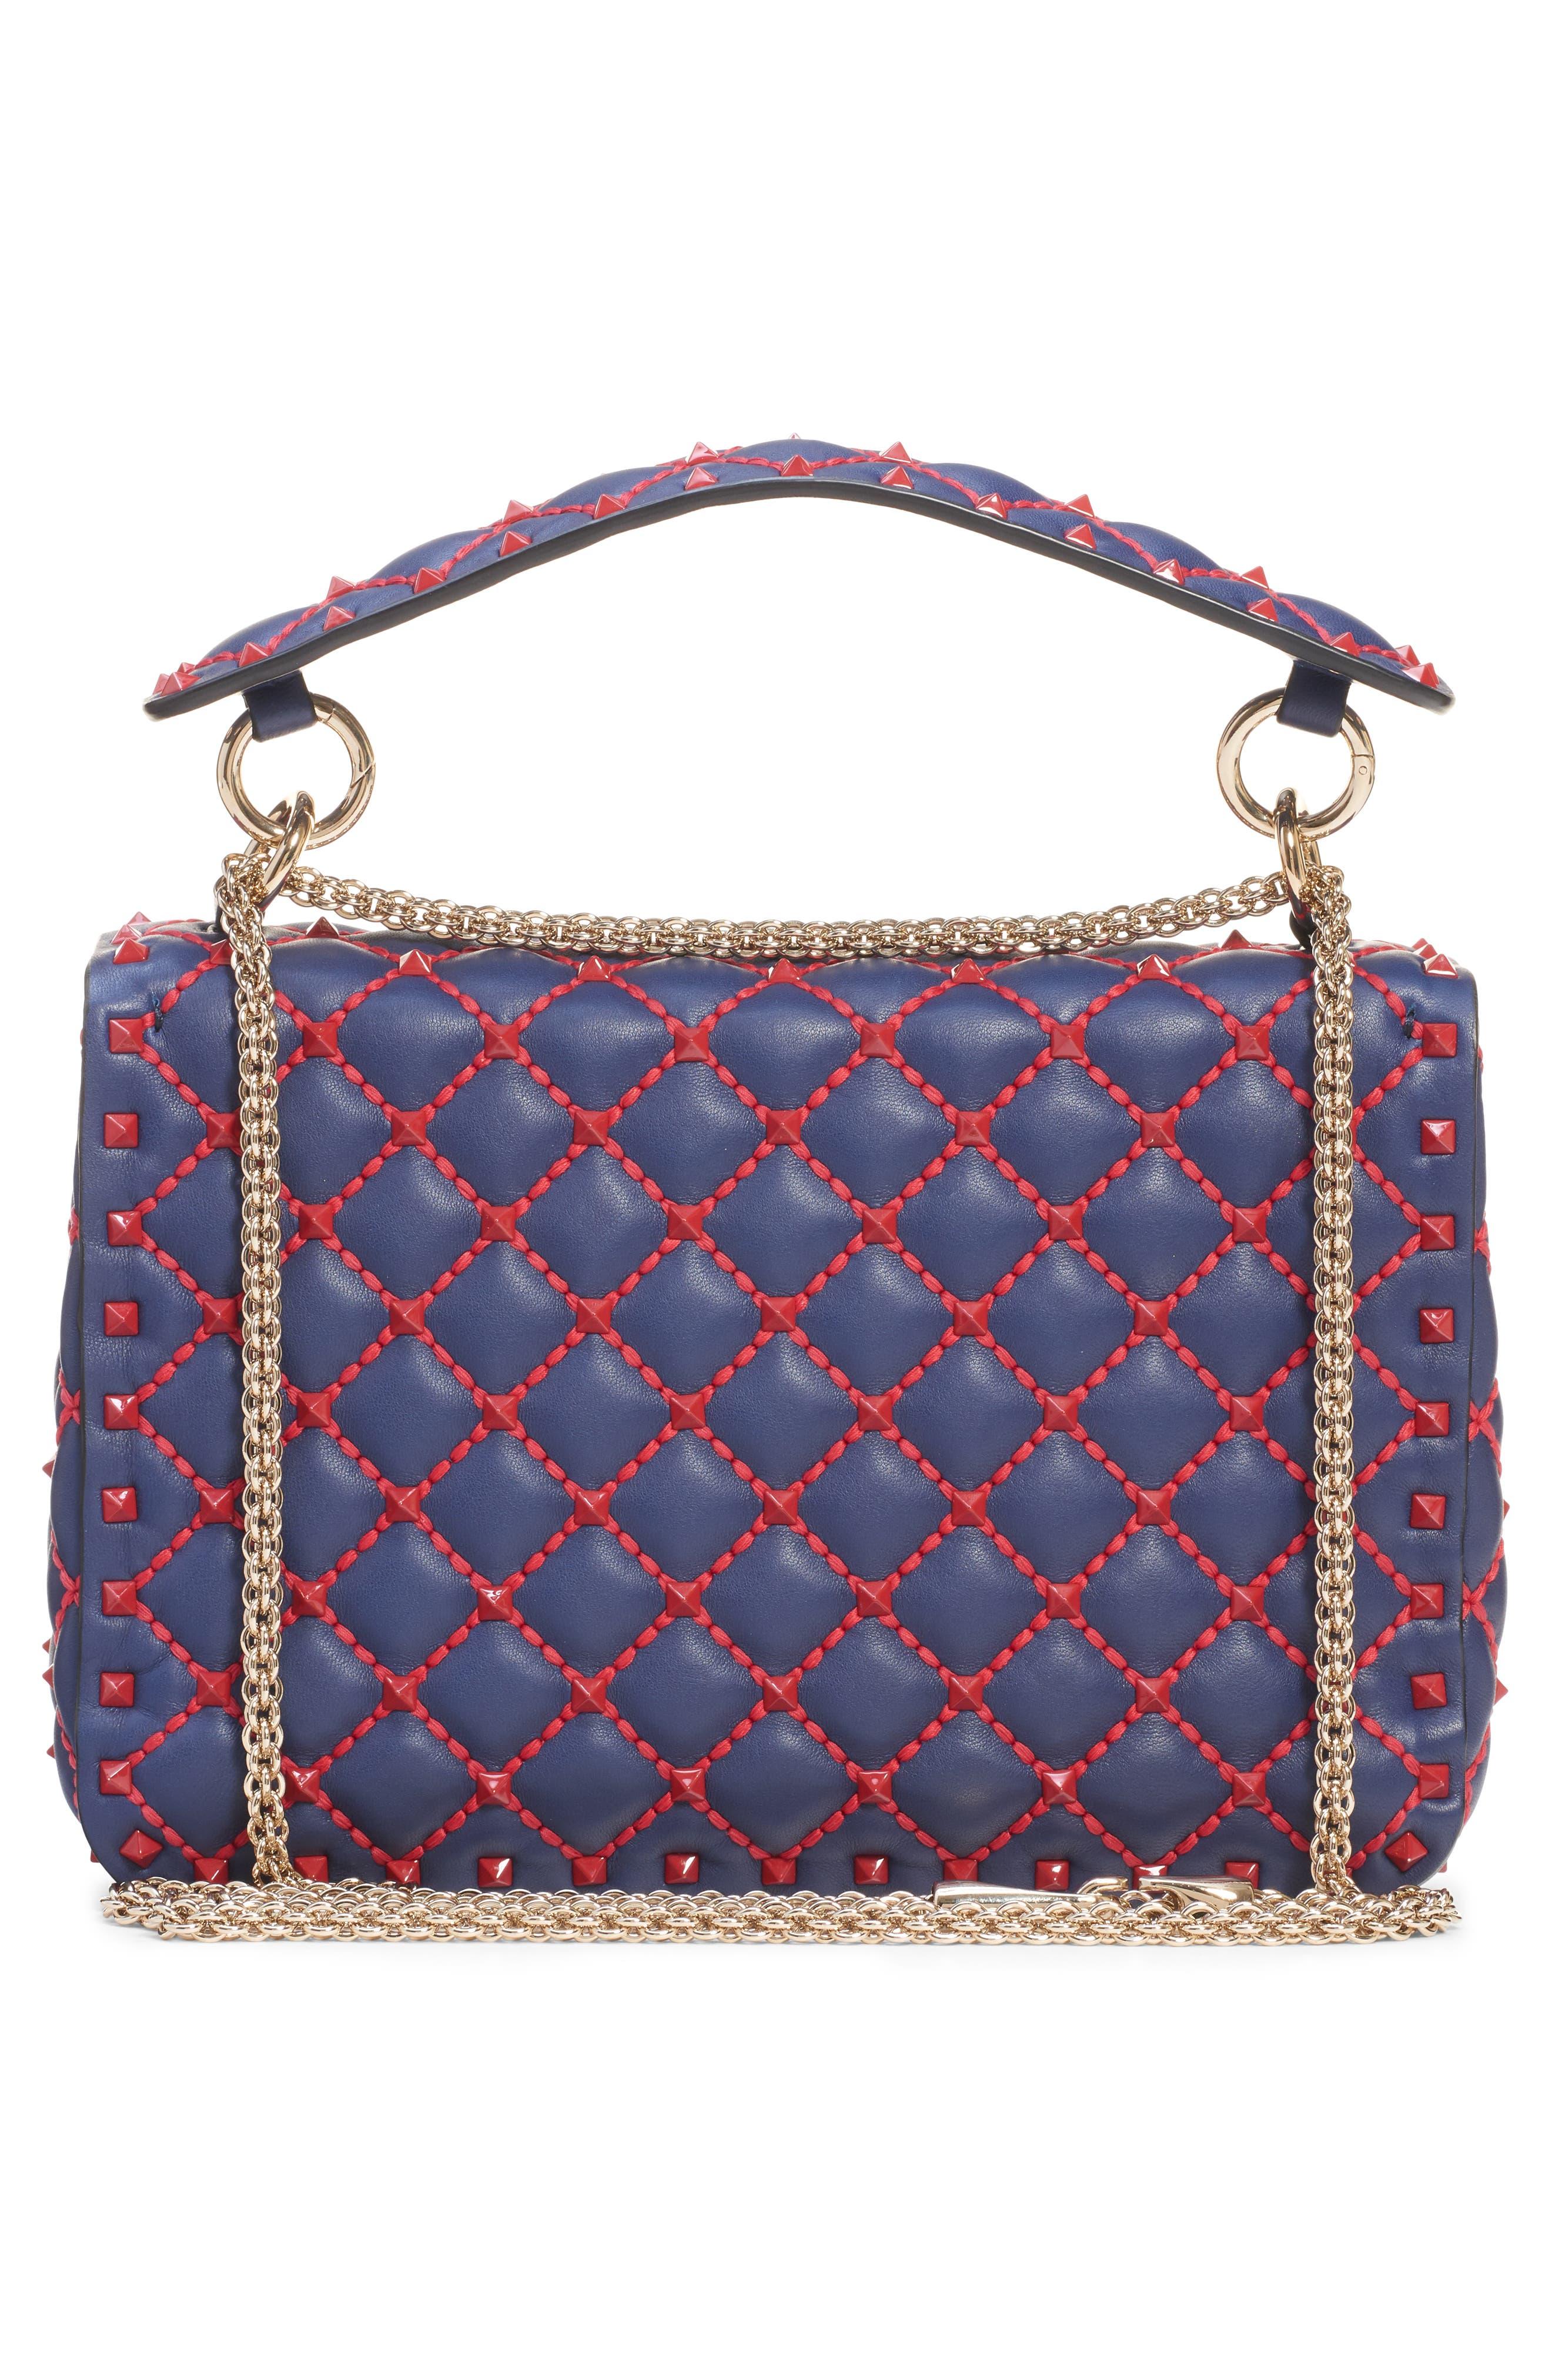 Medium Spike.It Leather Shoulder Bag,                             Alternate thumbnail 3, color,                             PURE BLUE/ ROSSO